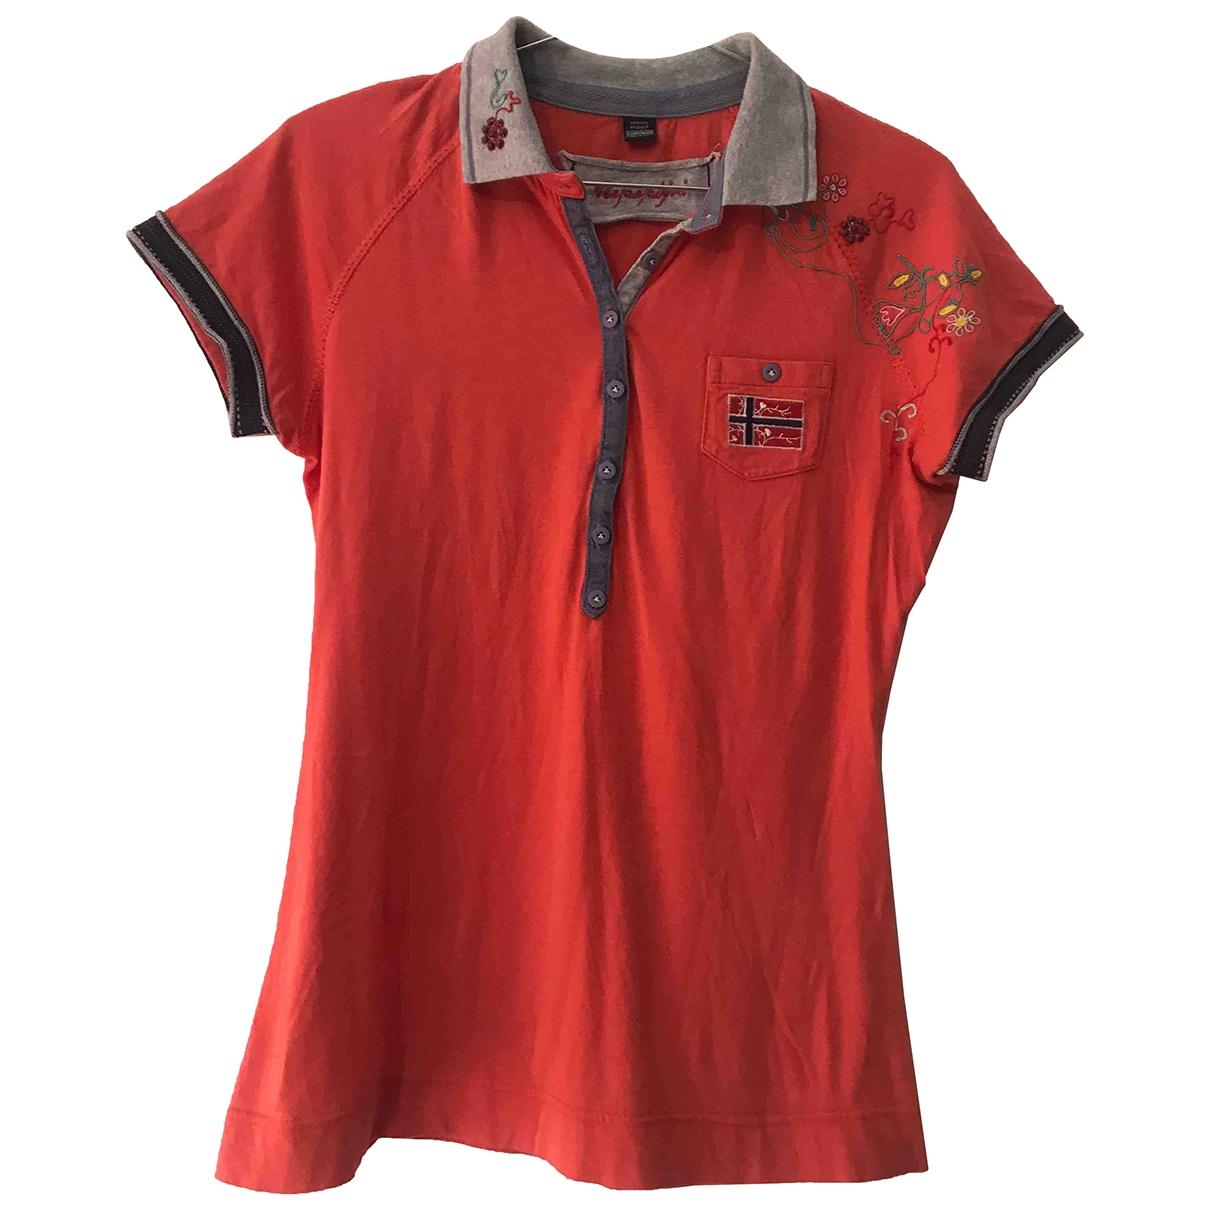 Napapijri \N Orange Cotton  top for Women S International